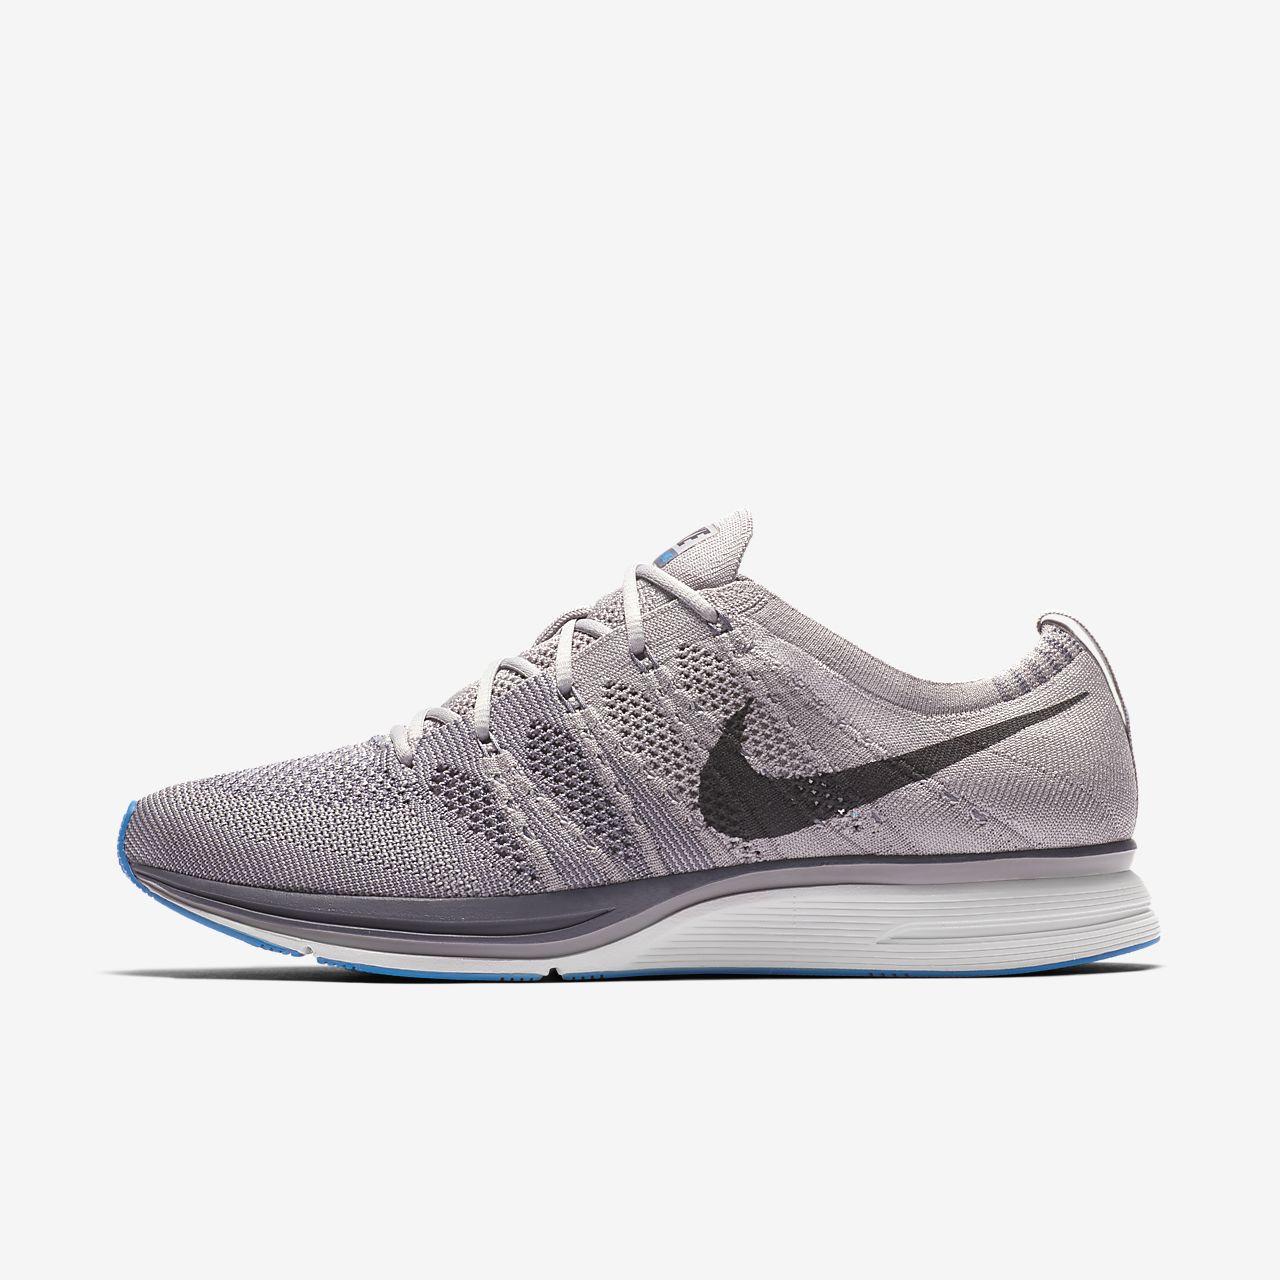 5f72cd04deb3 Nike Flyknit Trainer Unisex Shoe. Nike.com AU